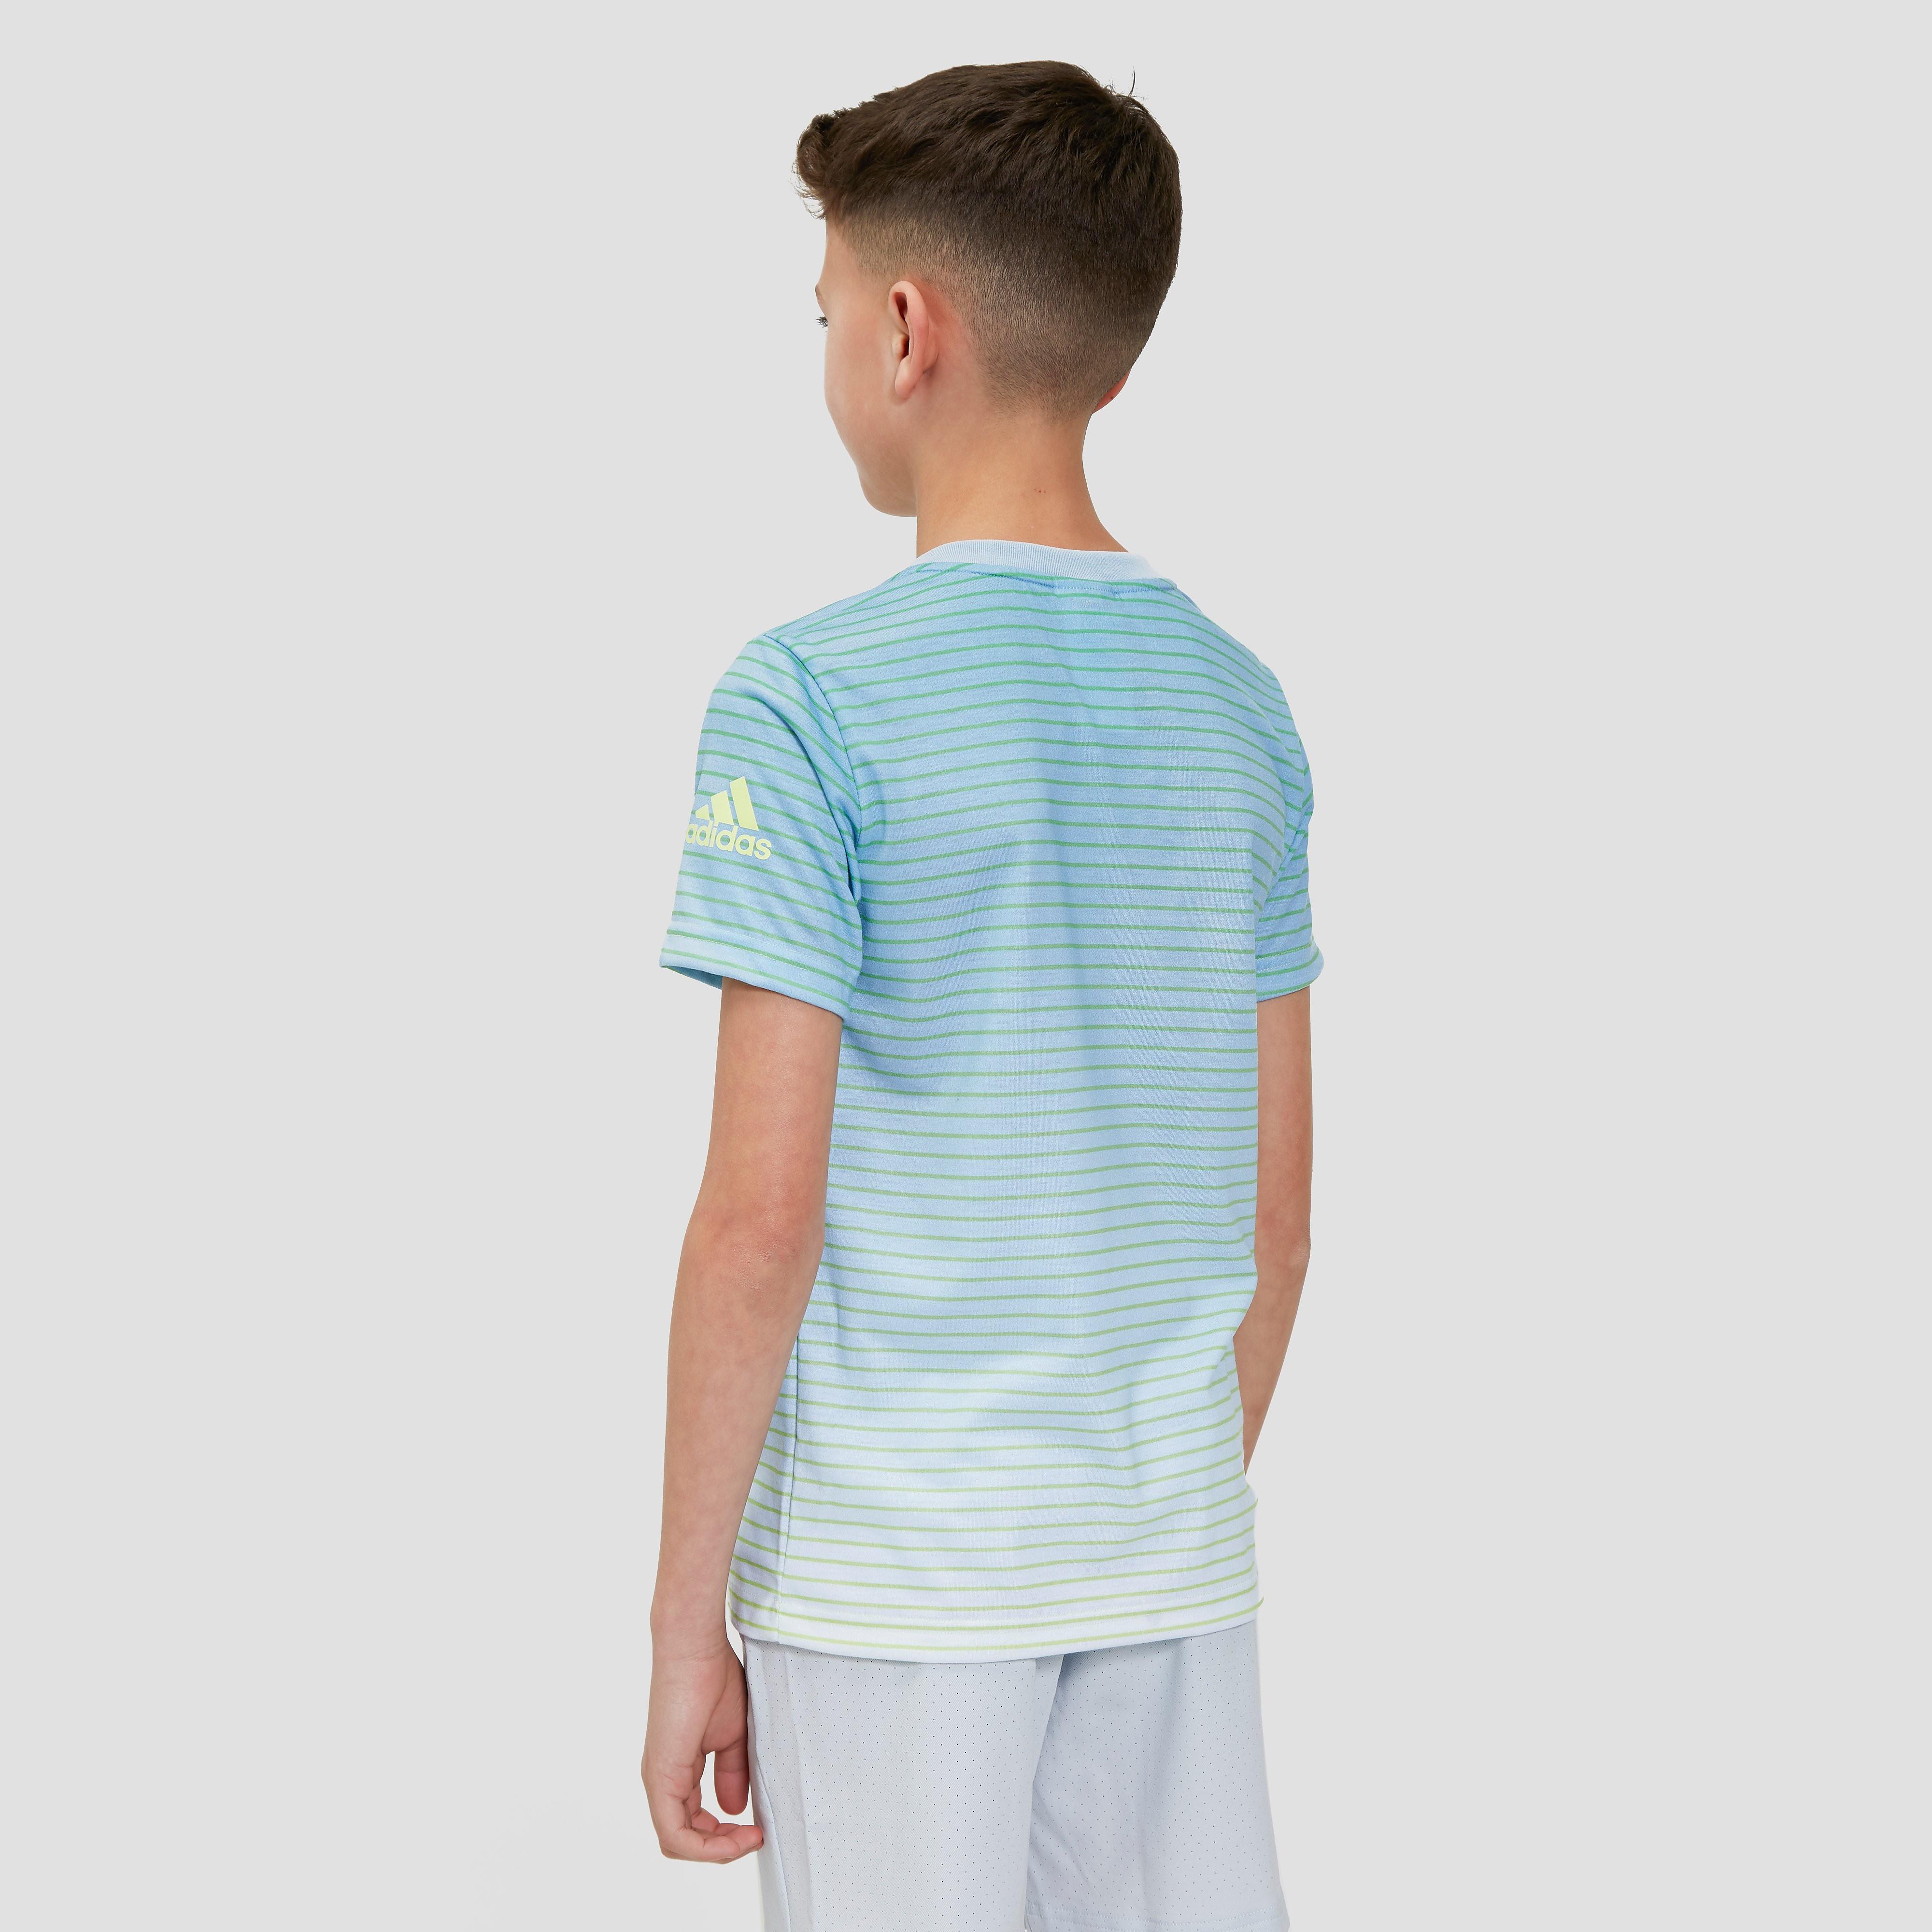 adidas Melbourne Striped Boys Tennis T-Shirt